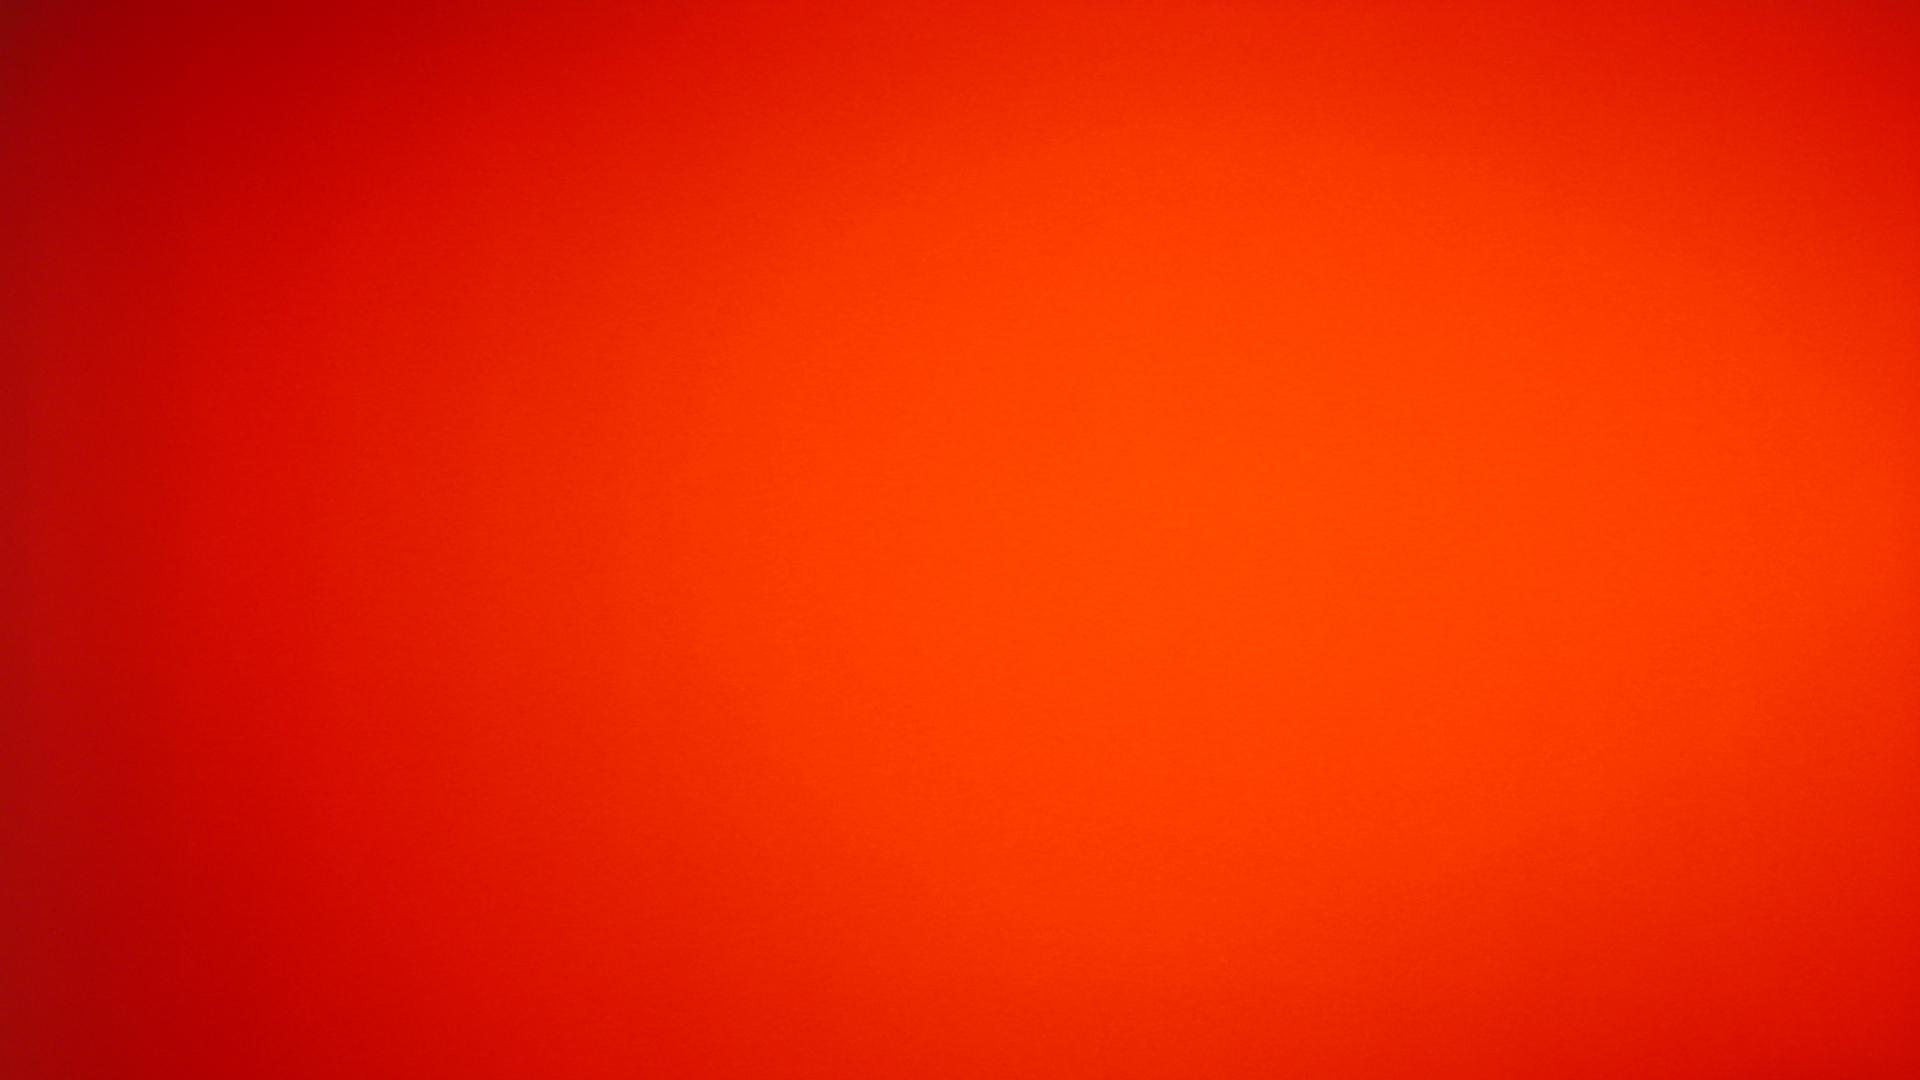 Free download red orange haze dark light gradient wallpaper